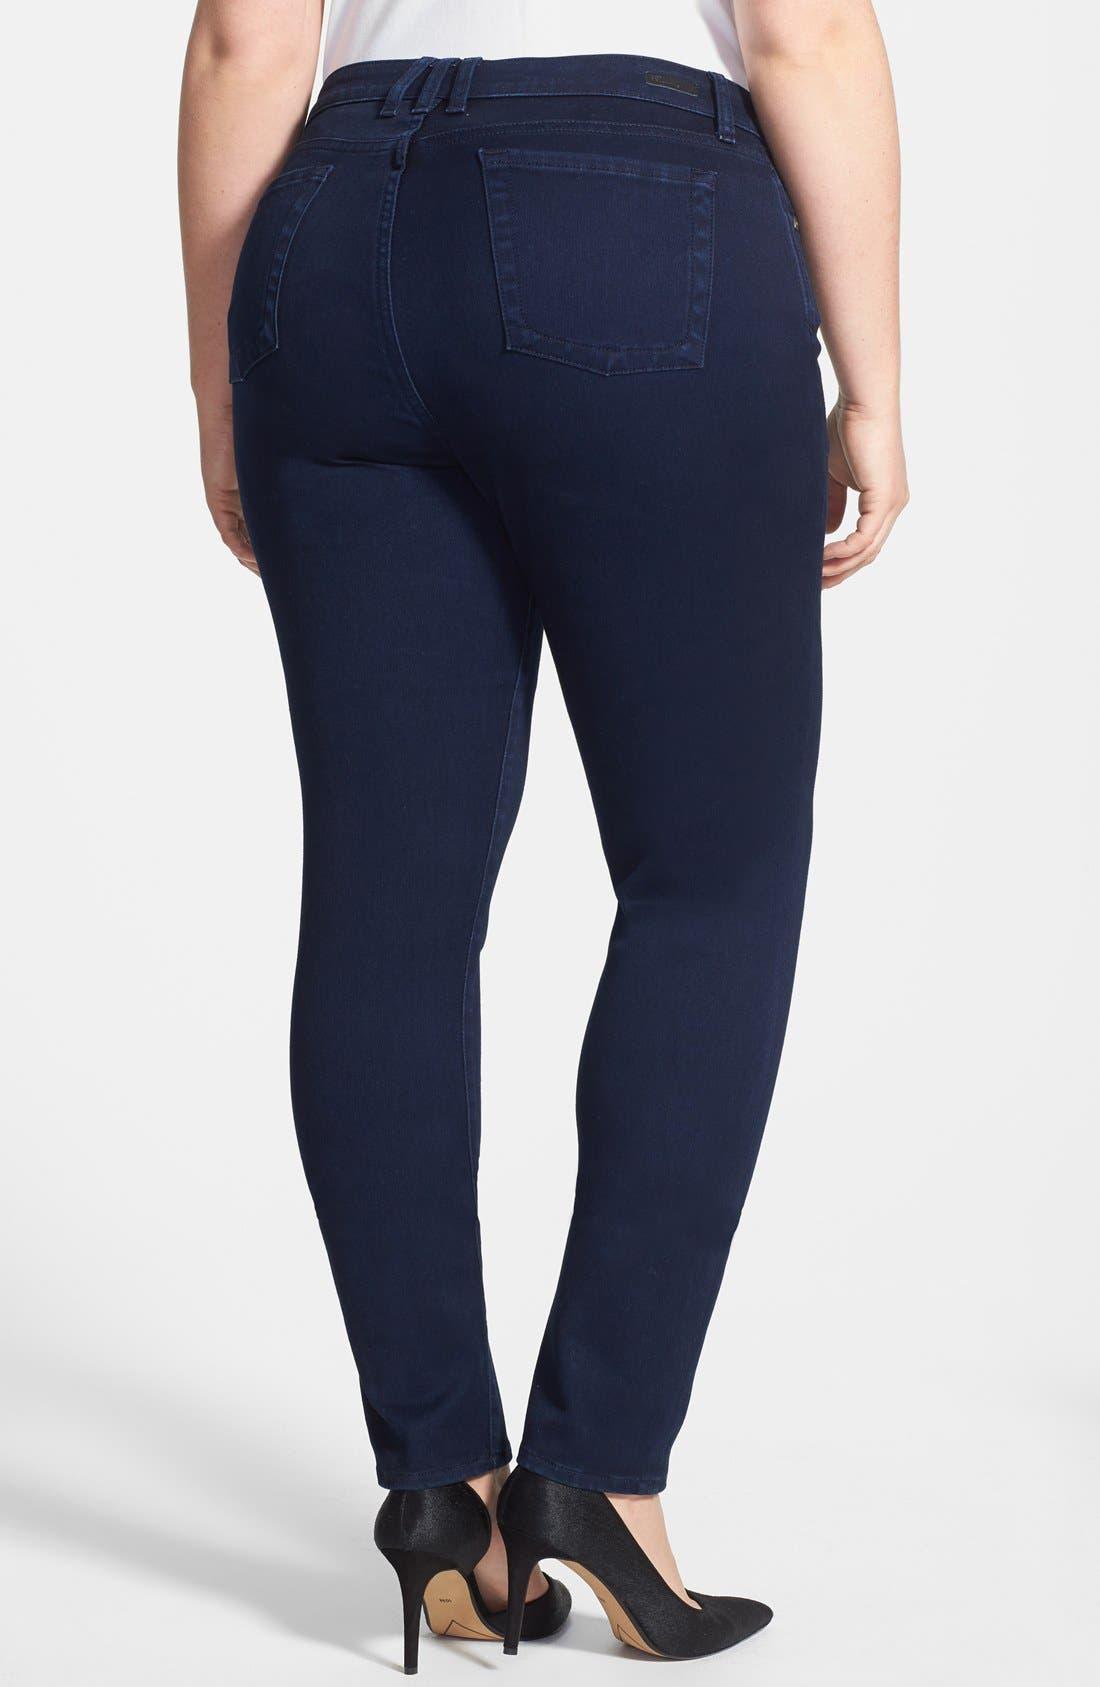 Alternate Image 2  - KUT from the Kloth 'Diana' Stretch Skinny Jeans (Discrete) (Plus Size)